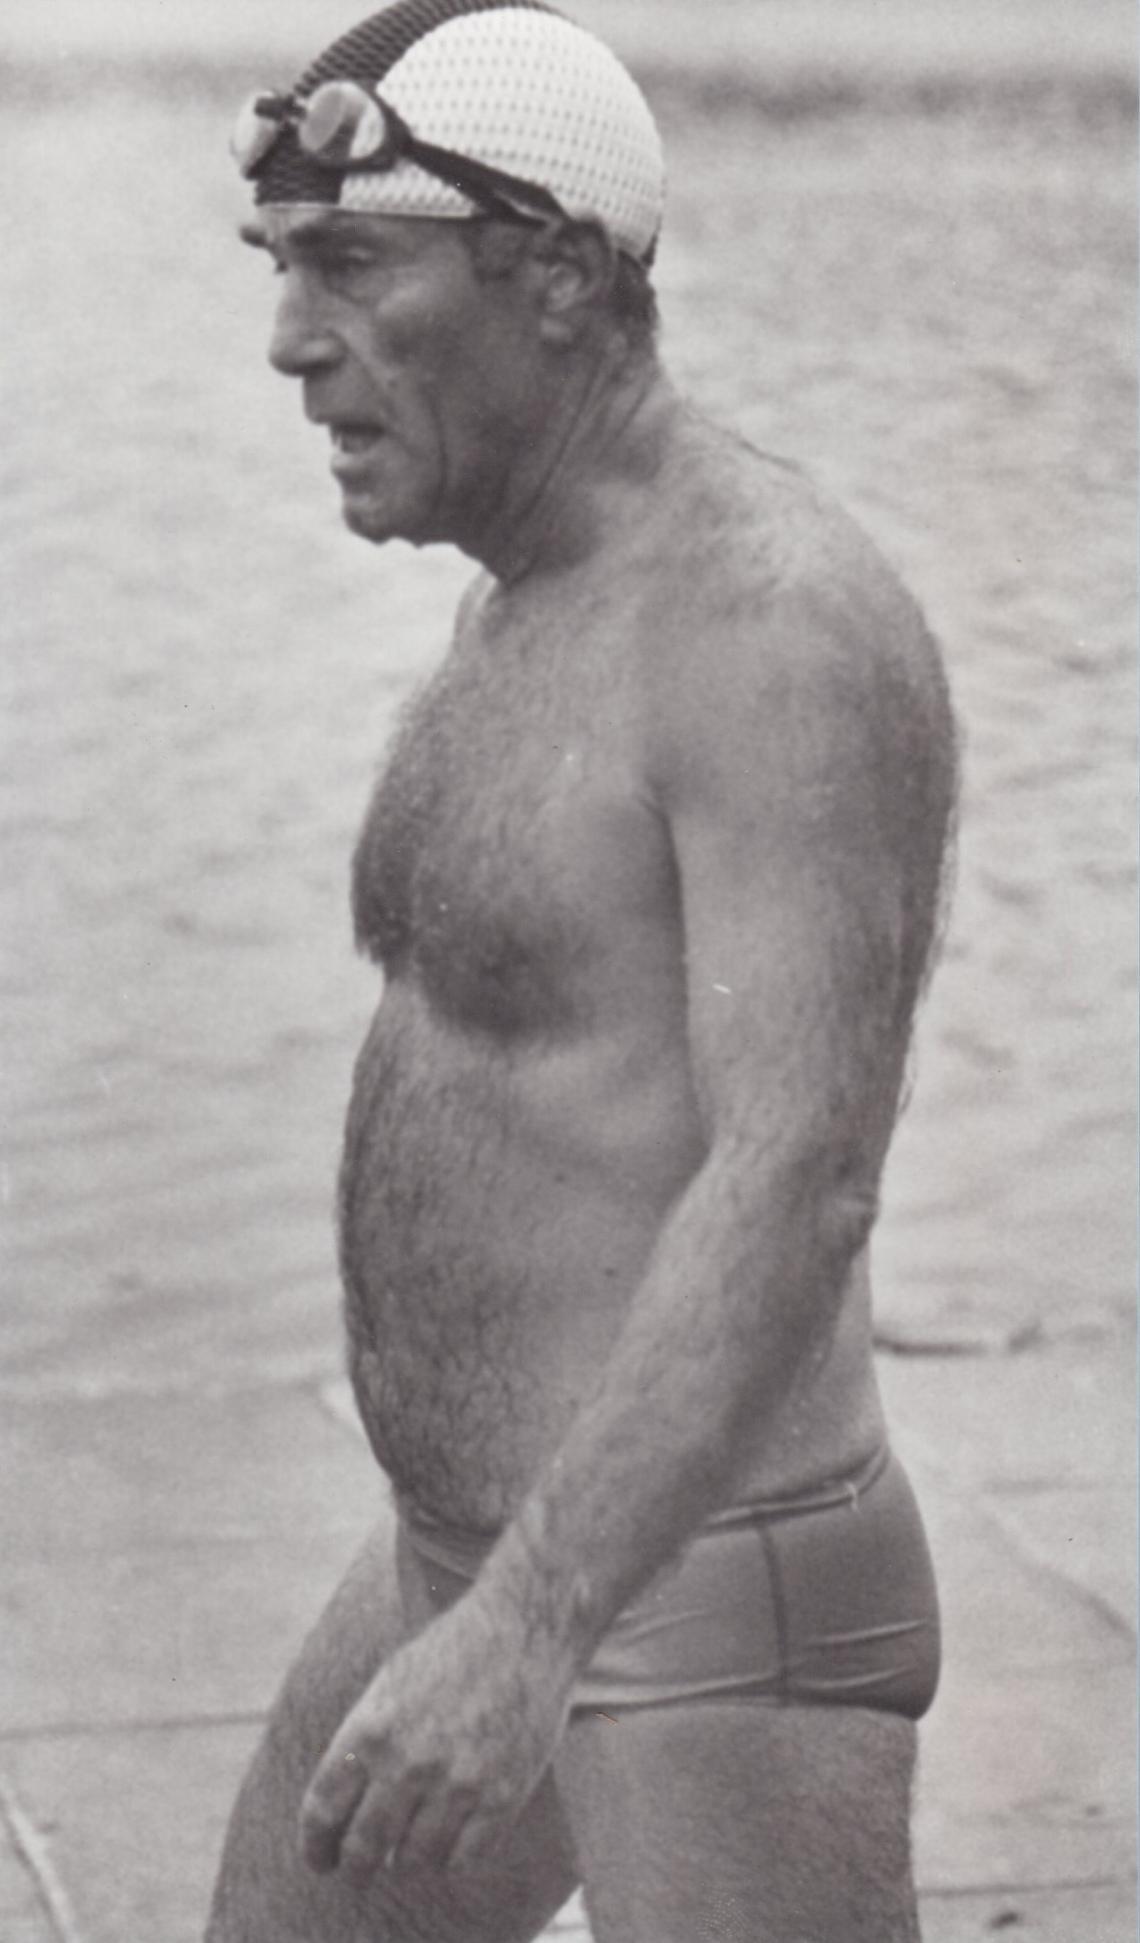 Bernard Alan Lacy, 9 July 1923 - 16 March 2020